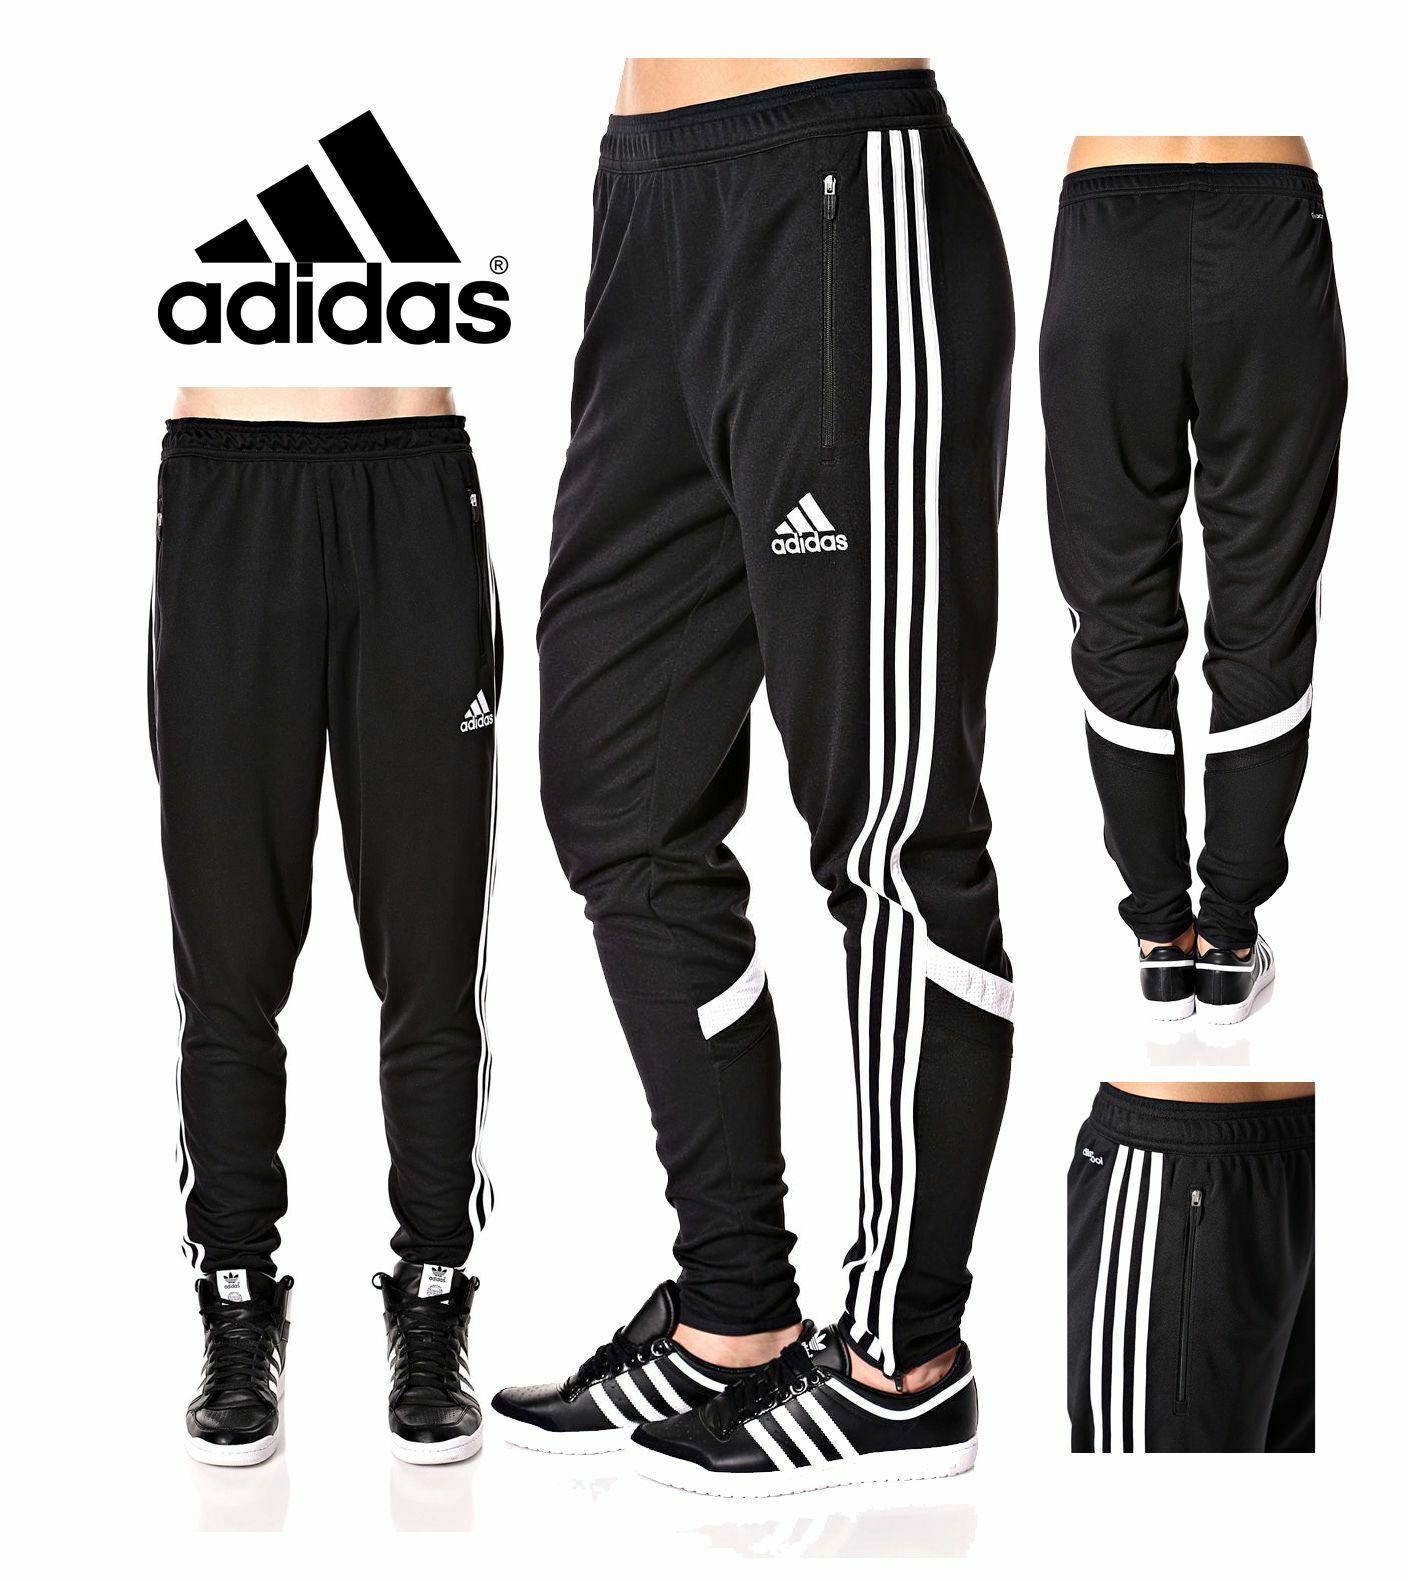 Adidas Men's Speedkick Condivo Hoodie (BlackOrange) | Mens